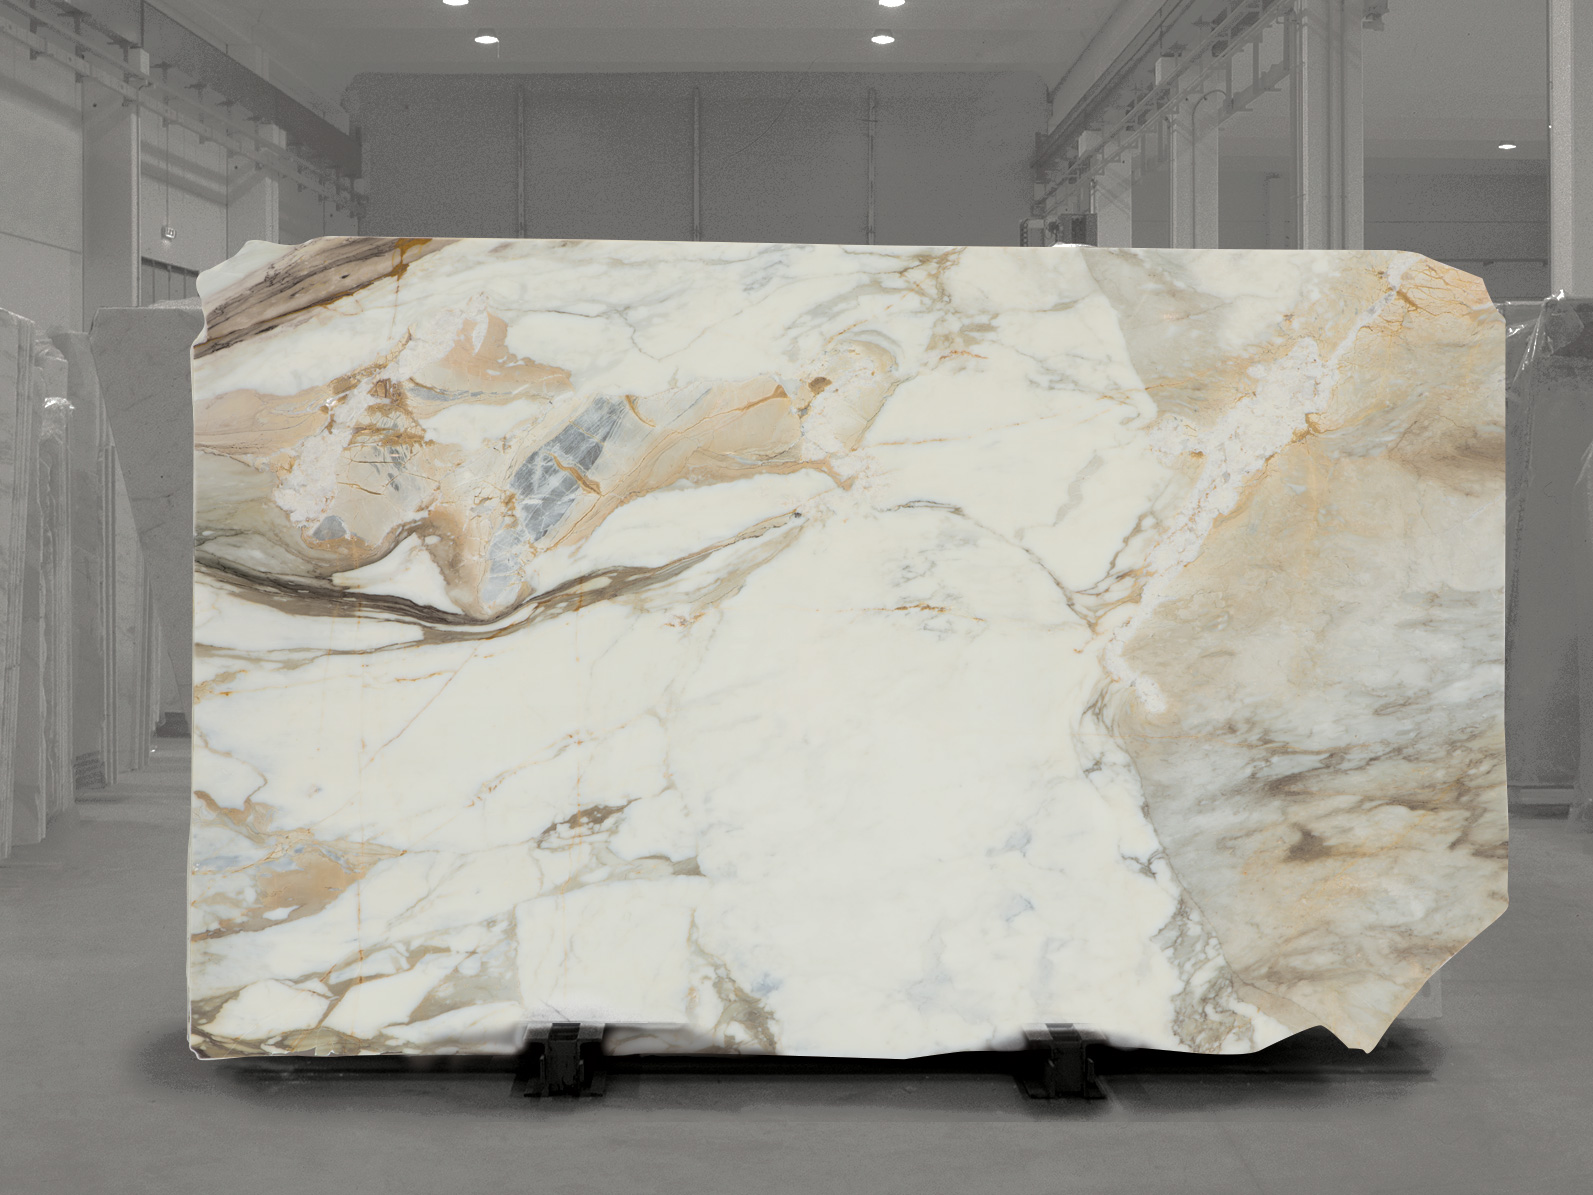 Sensational Marble Slabs Carrara Standard Sizes And Thickness Machost Co Dining Chair Design Ideas Machostcouk